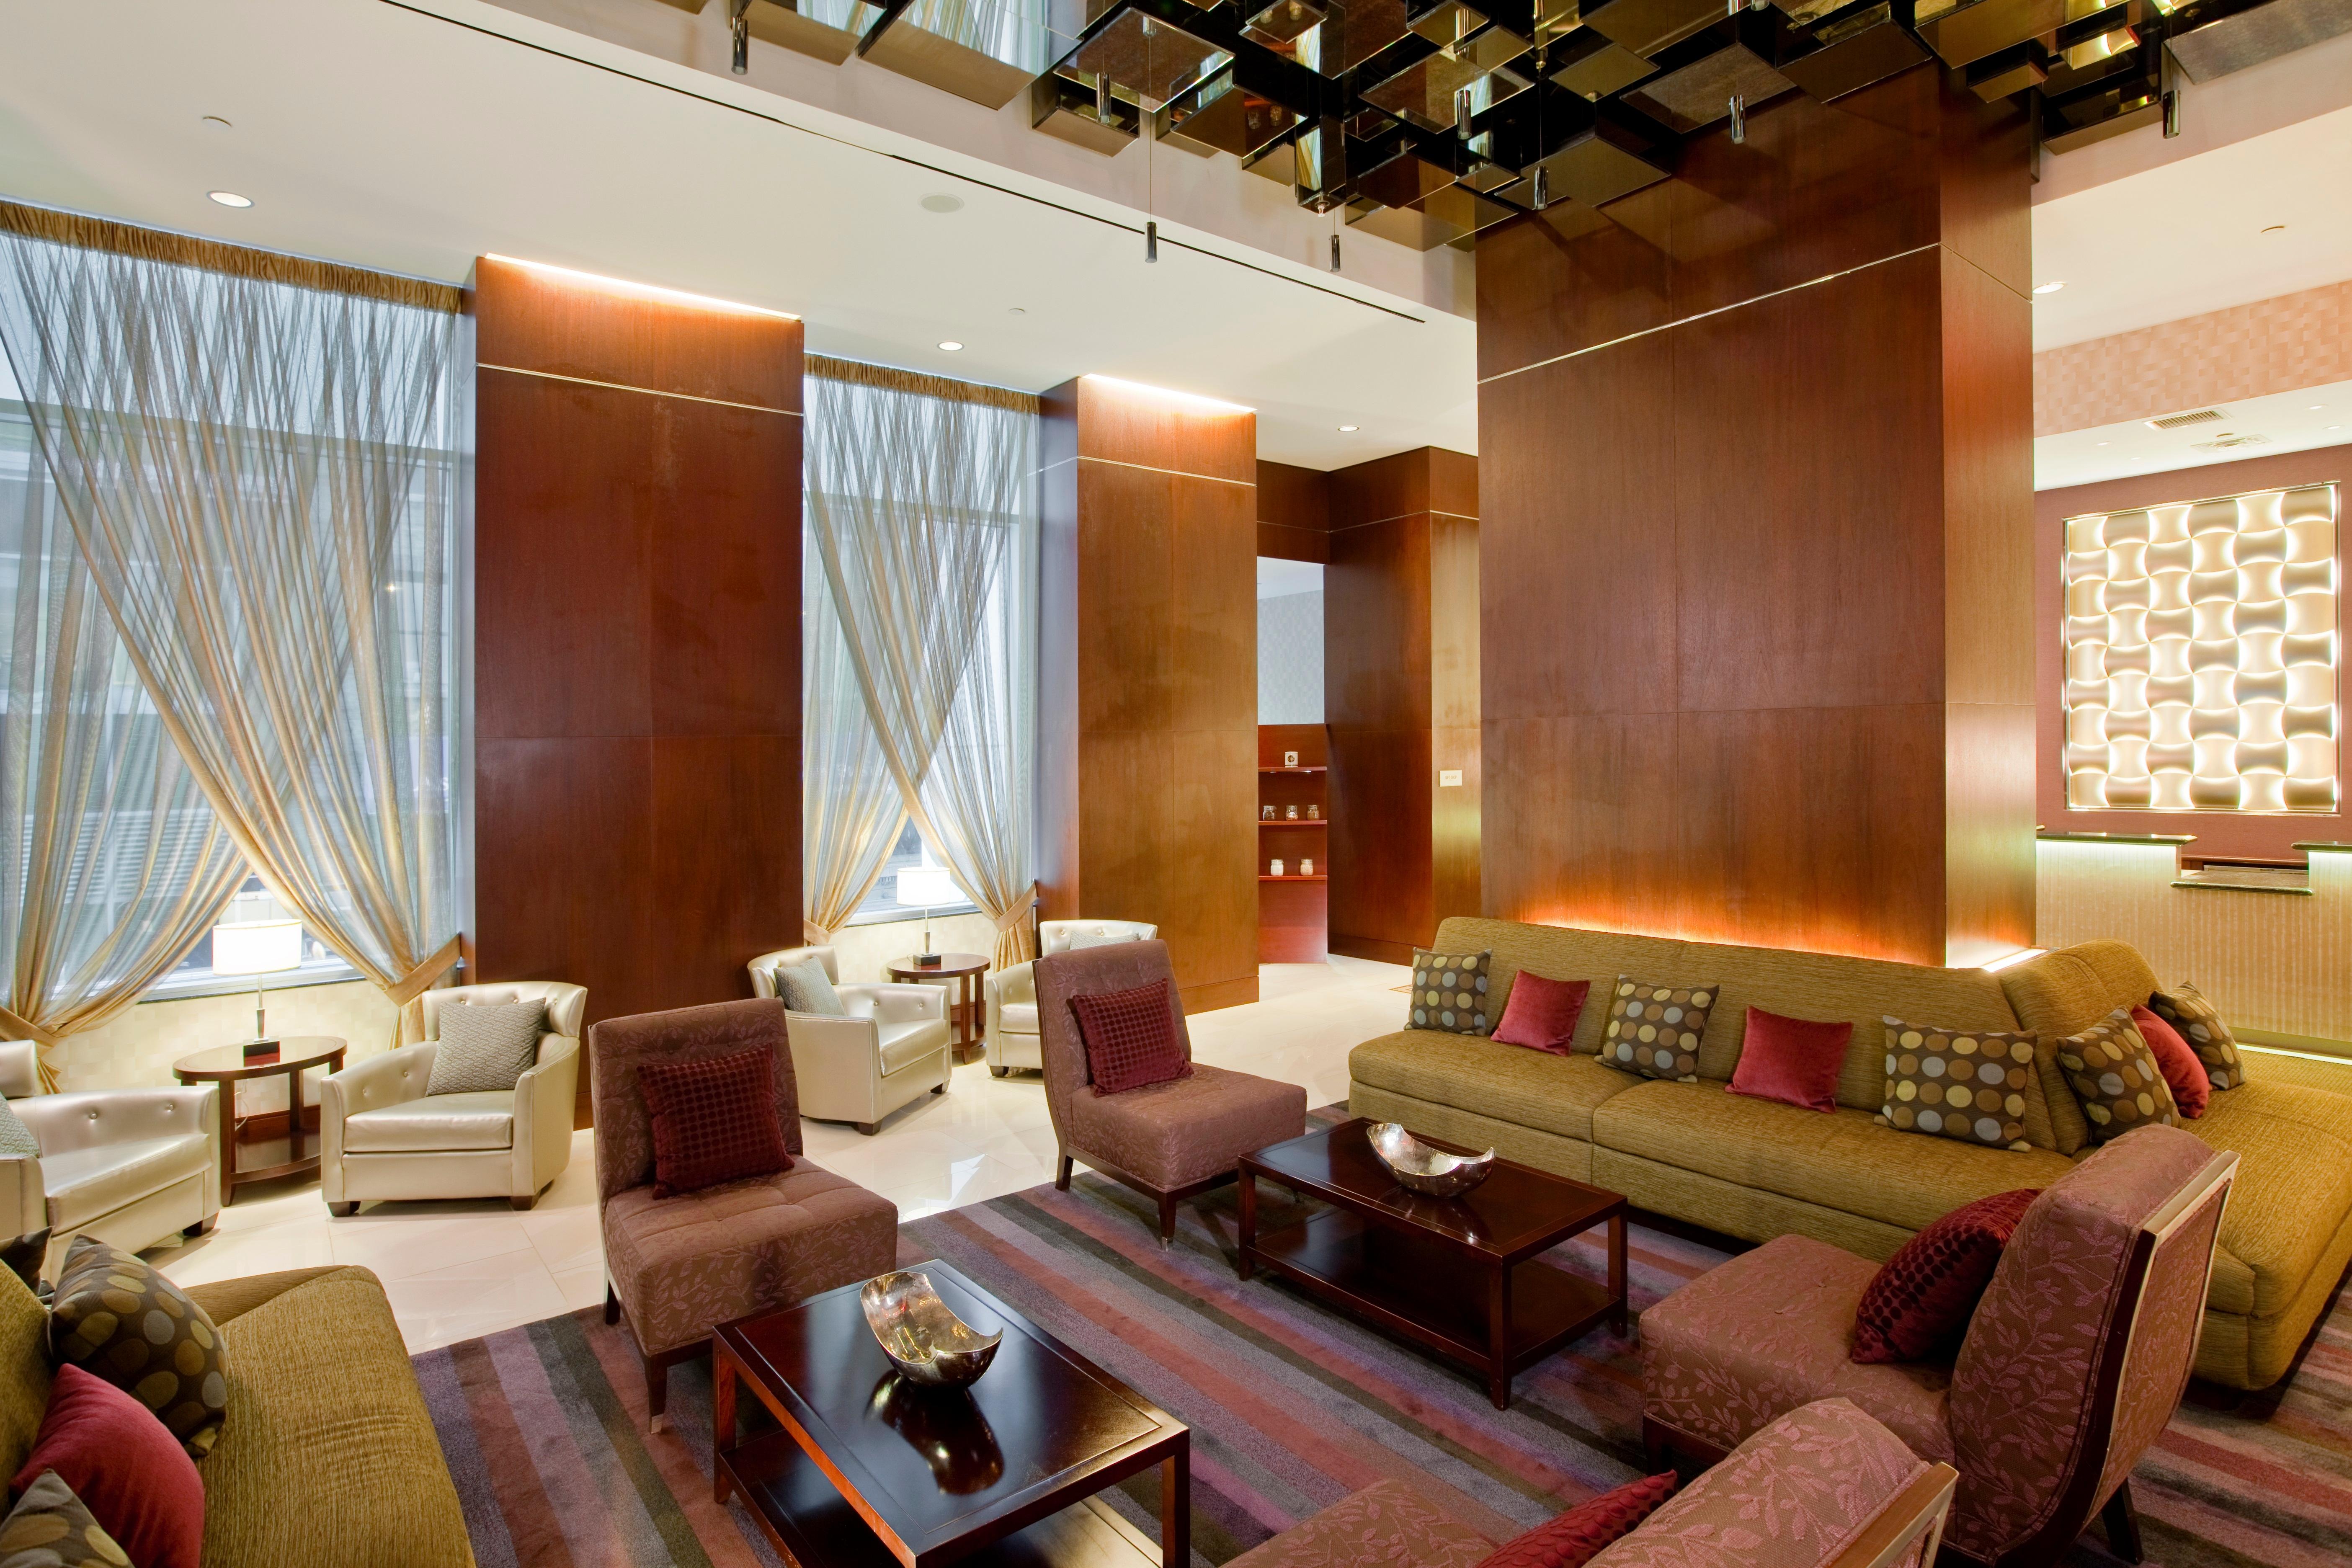 Doubletree By Hilton Hotel New York City Financial District New York New York Ny